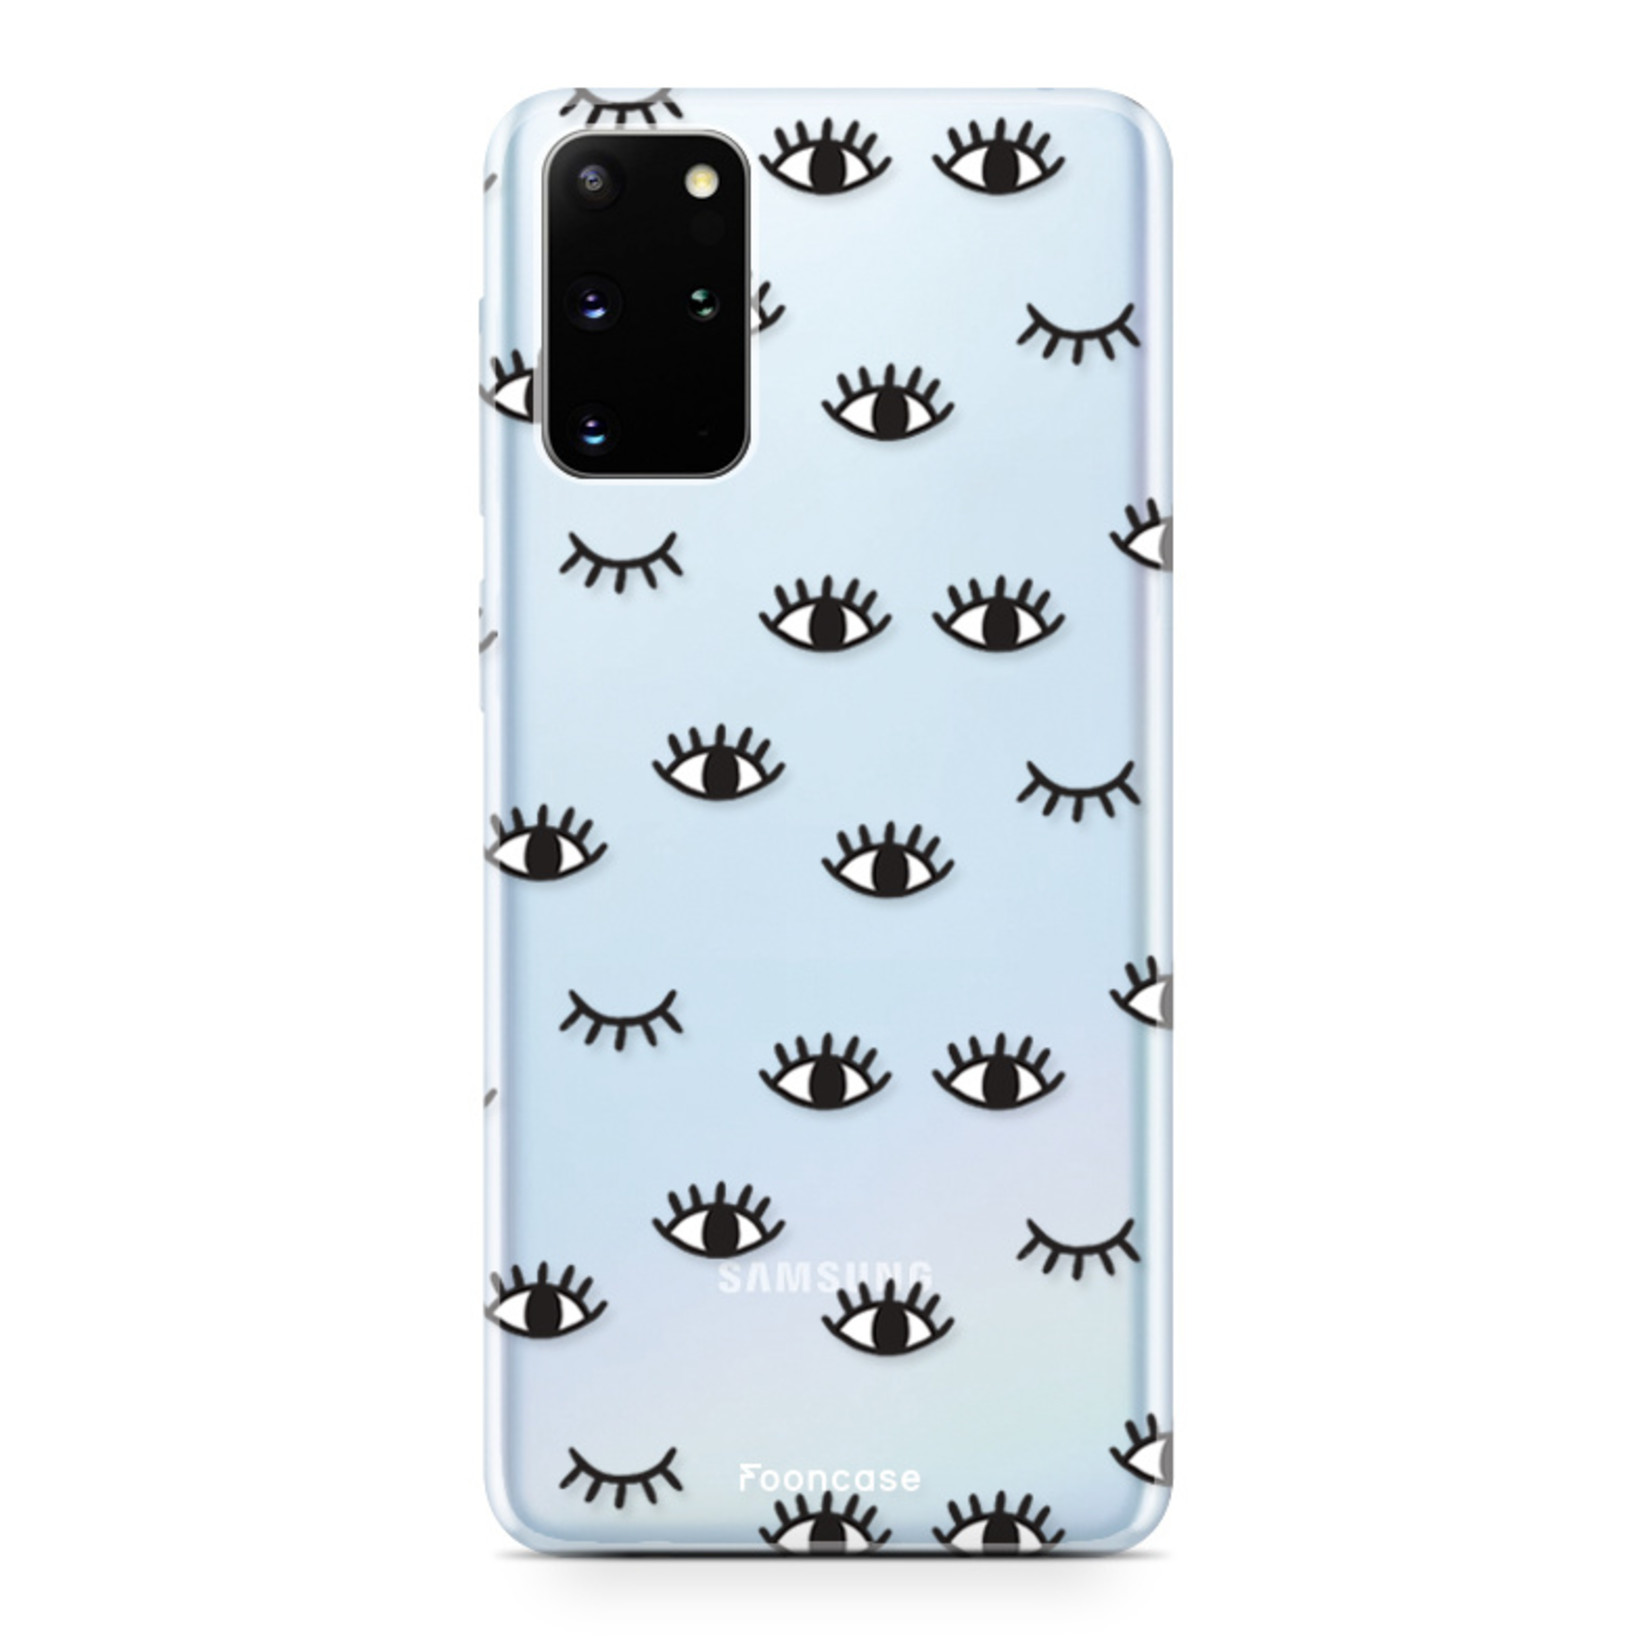 FOONCASE Samsung Galaxy S20 FE hoesje TPU Soft Case - Back Cover - Eyes / Ogen